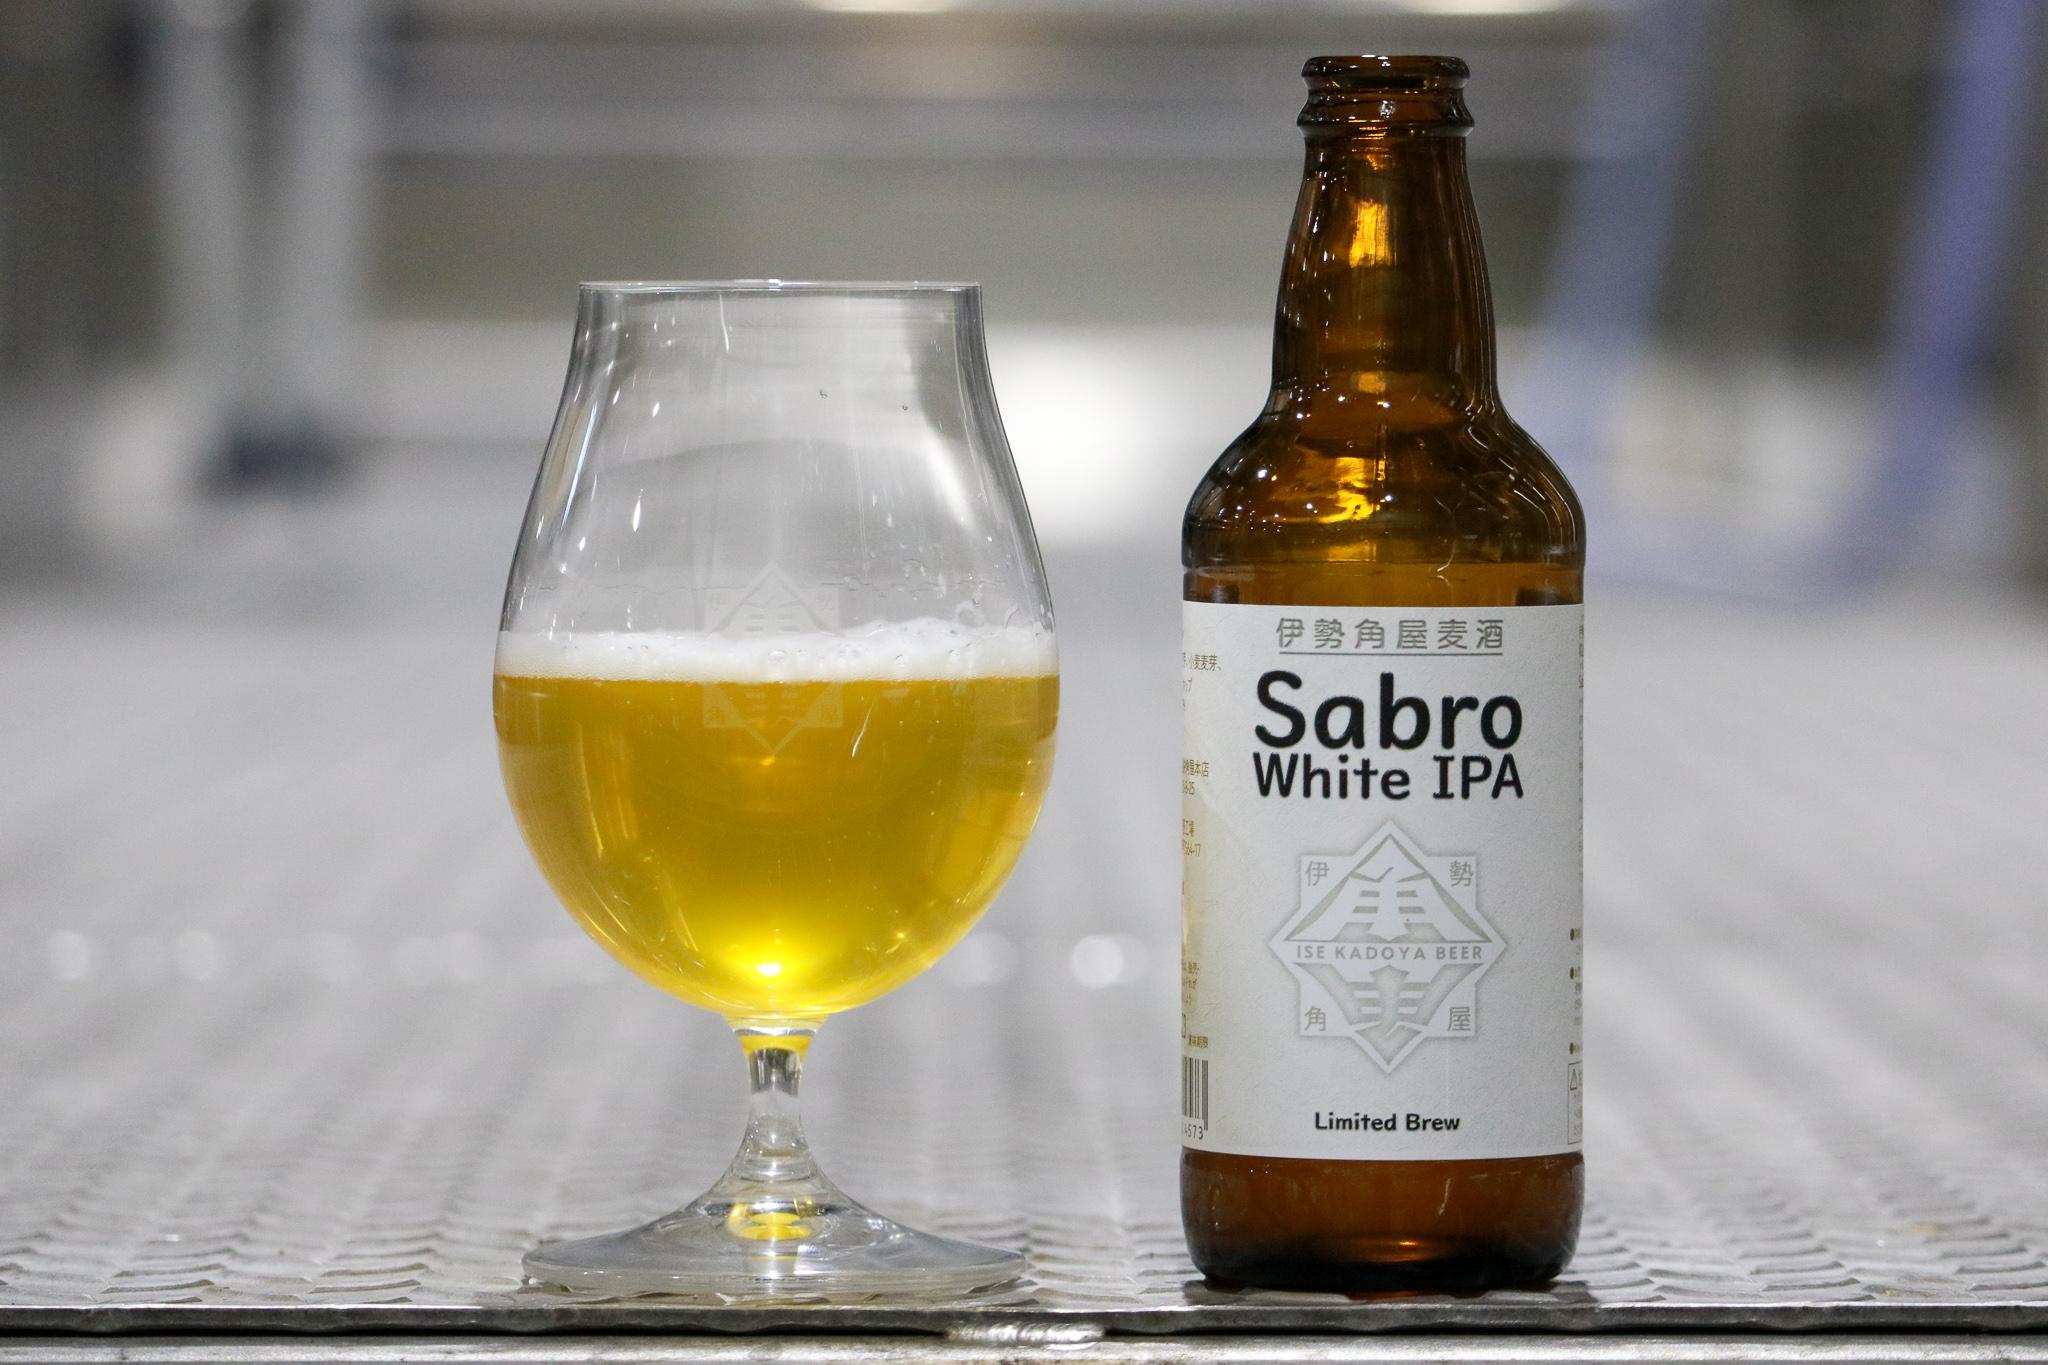 Sabro White IPA味わい